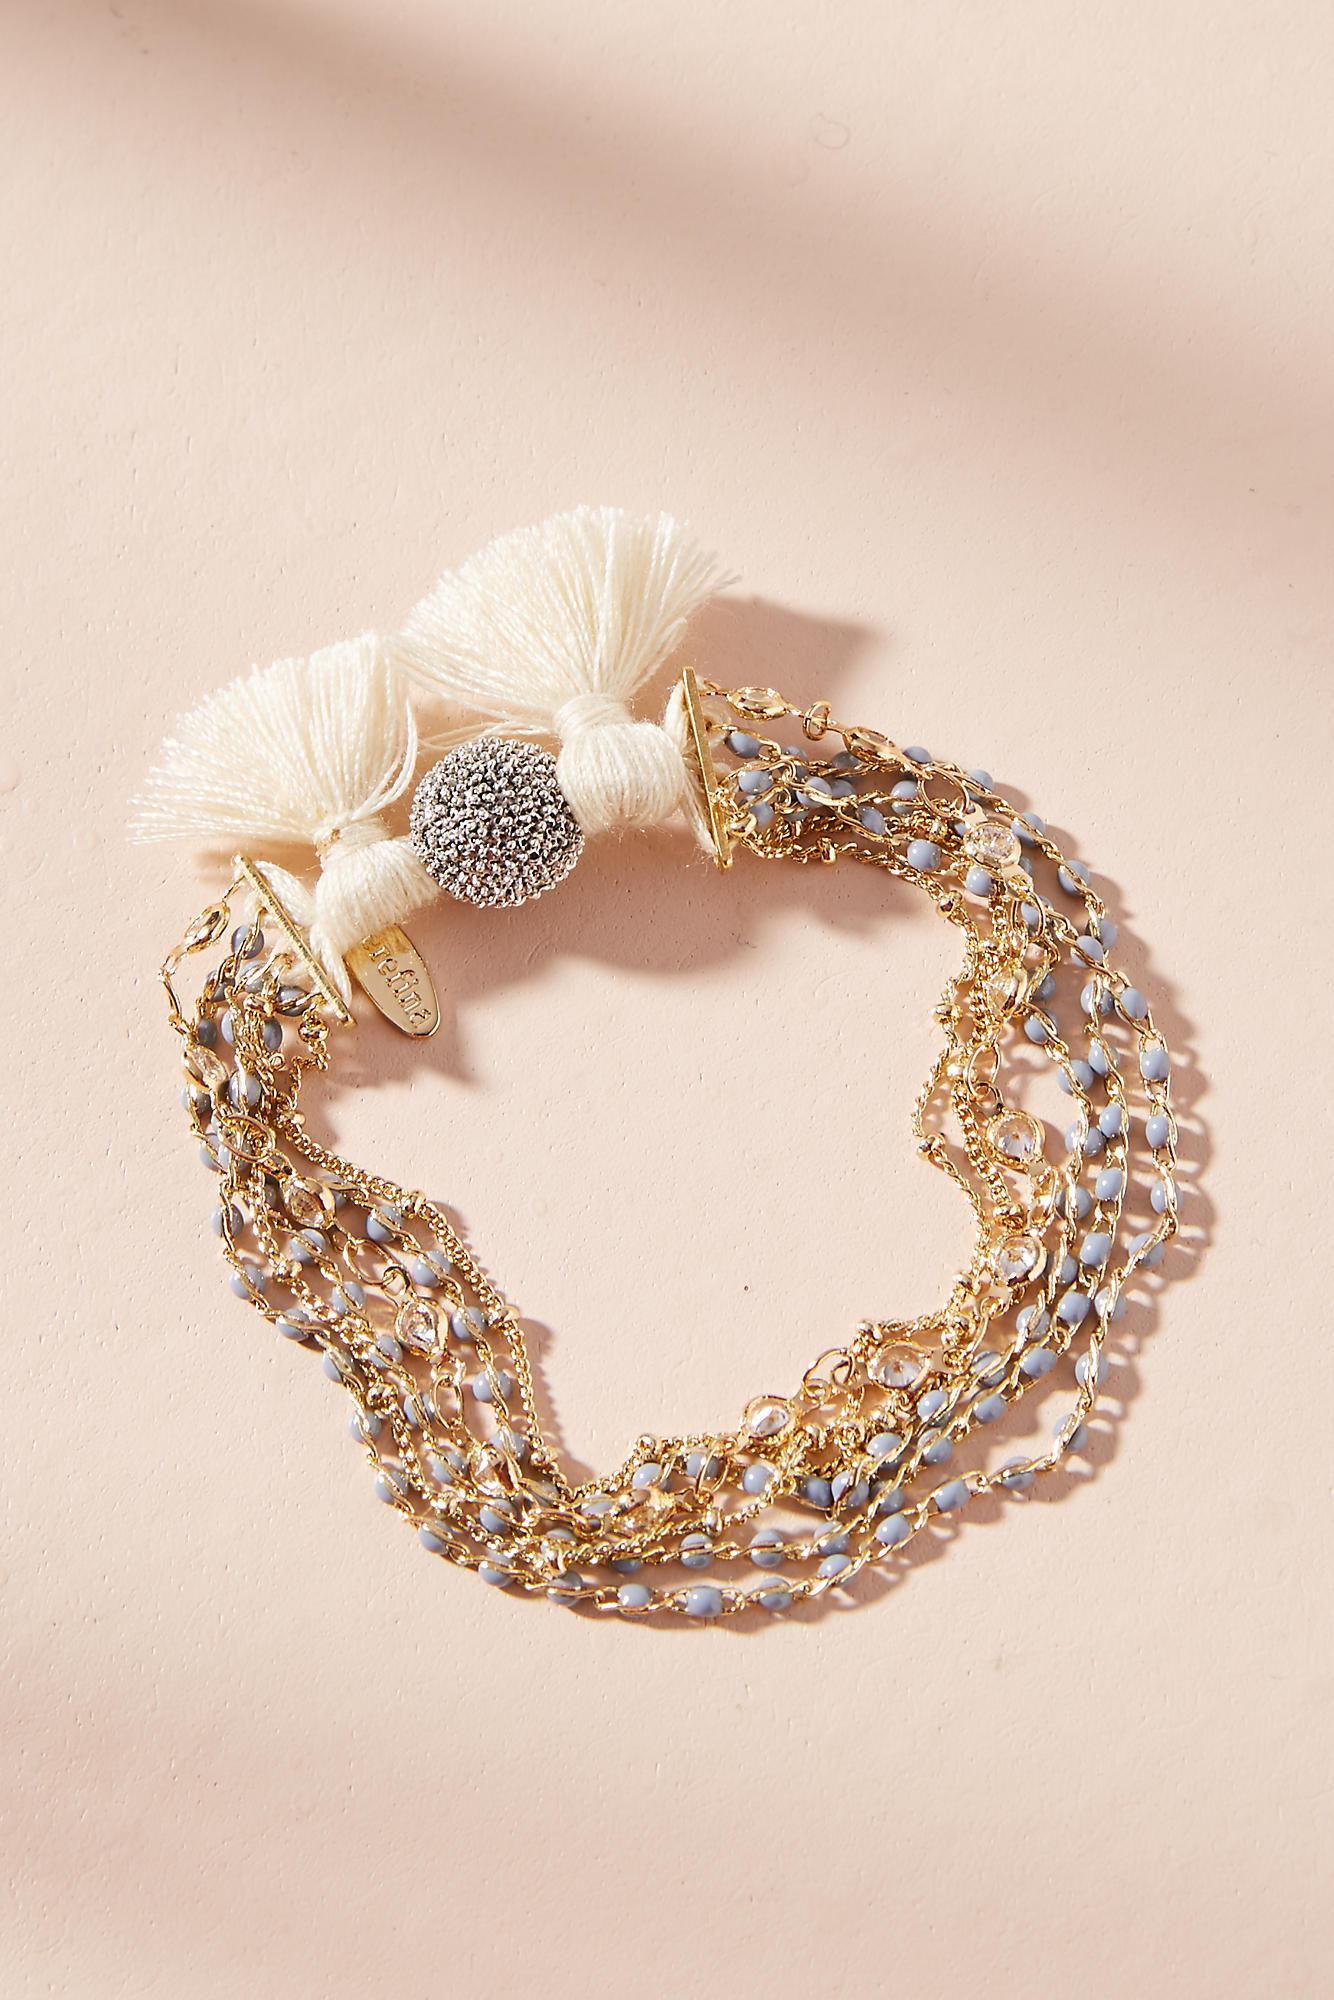 Anthropologie Mabyn Layered Bracelet 5ZA4u3BI